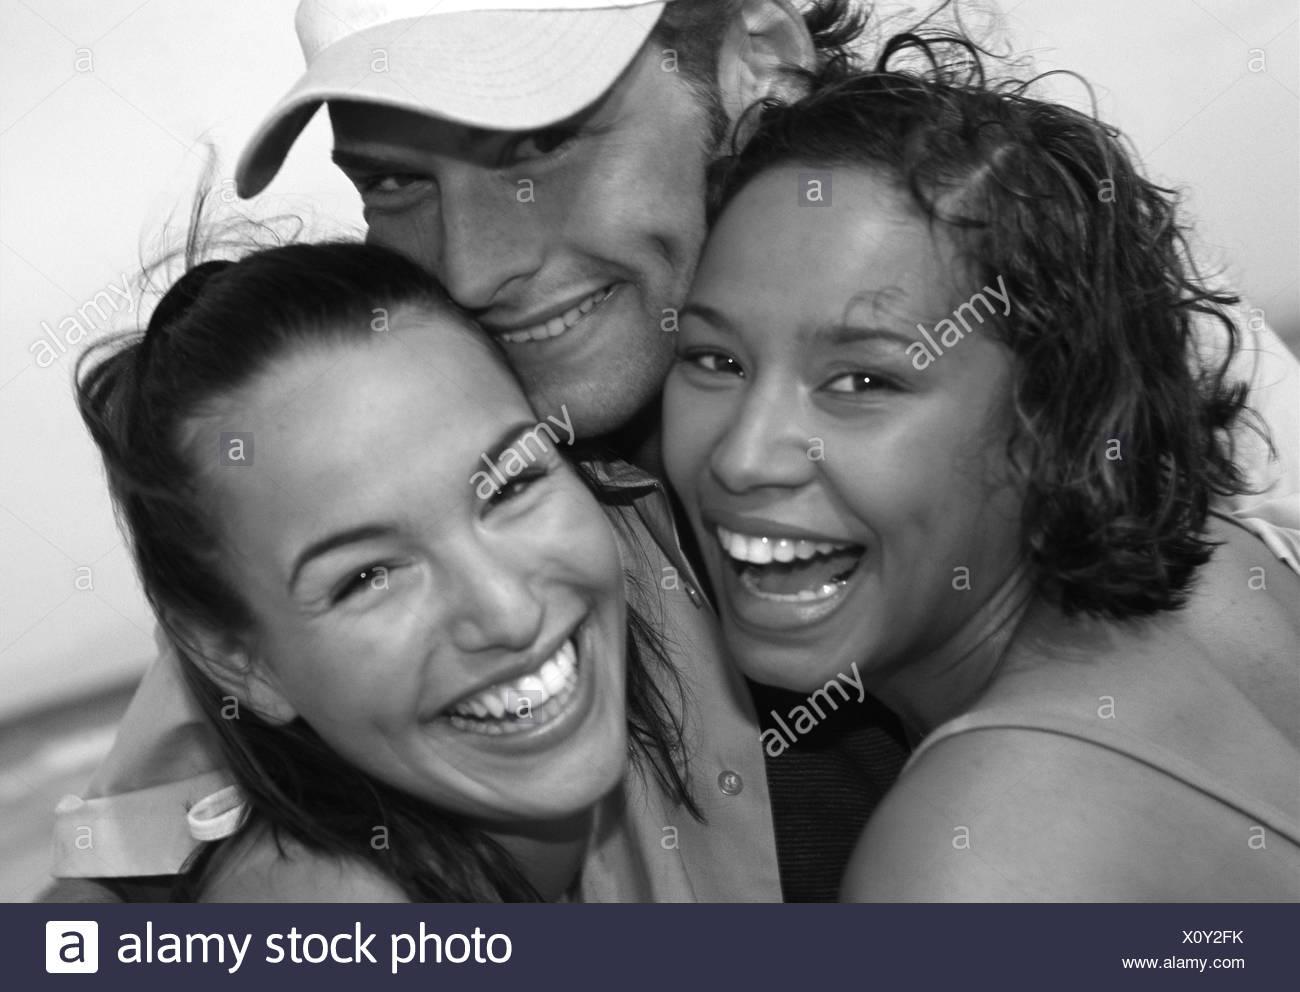 Three friends - Stock Image